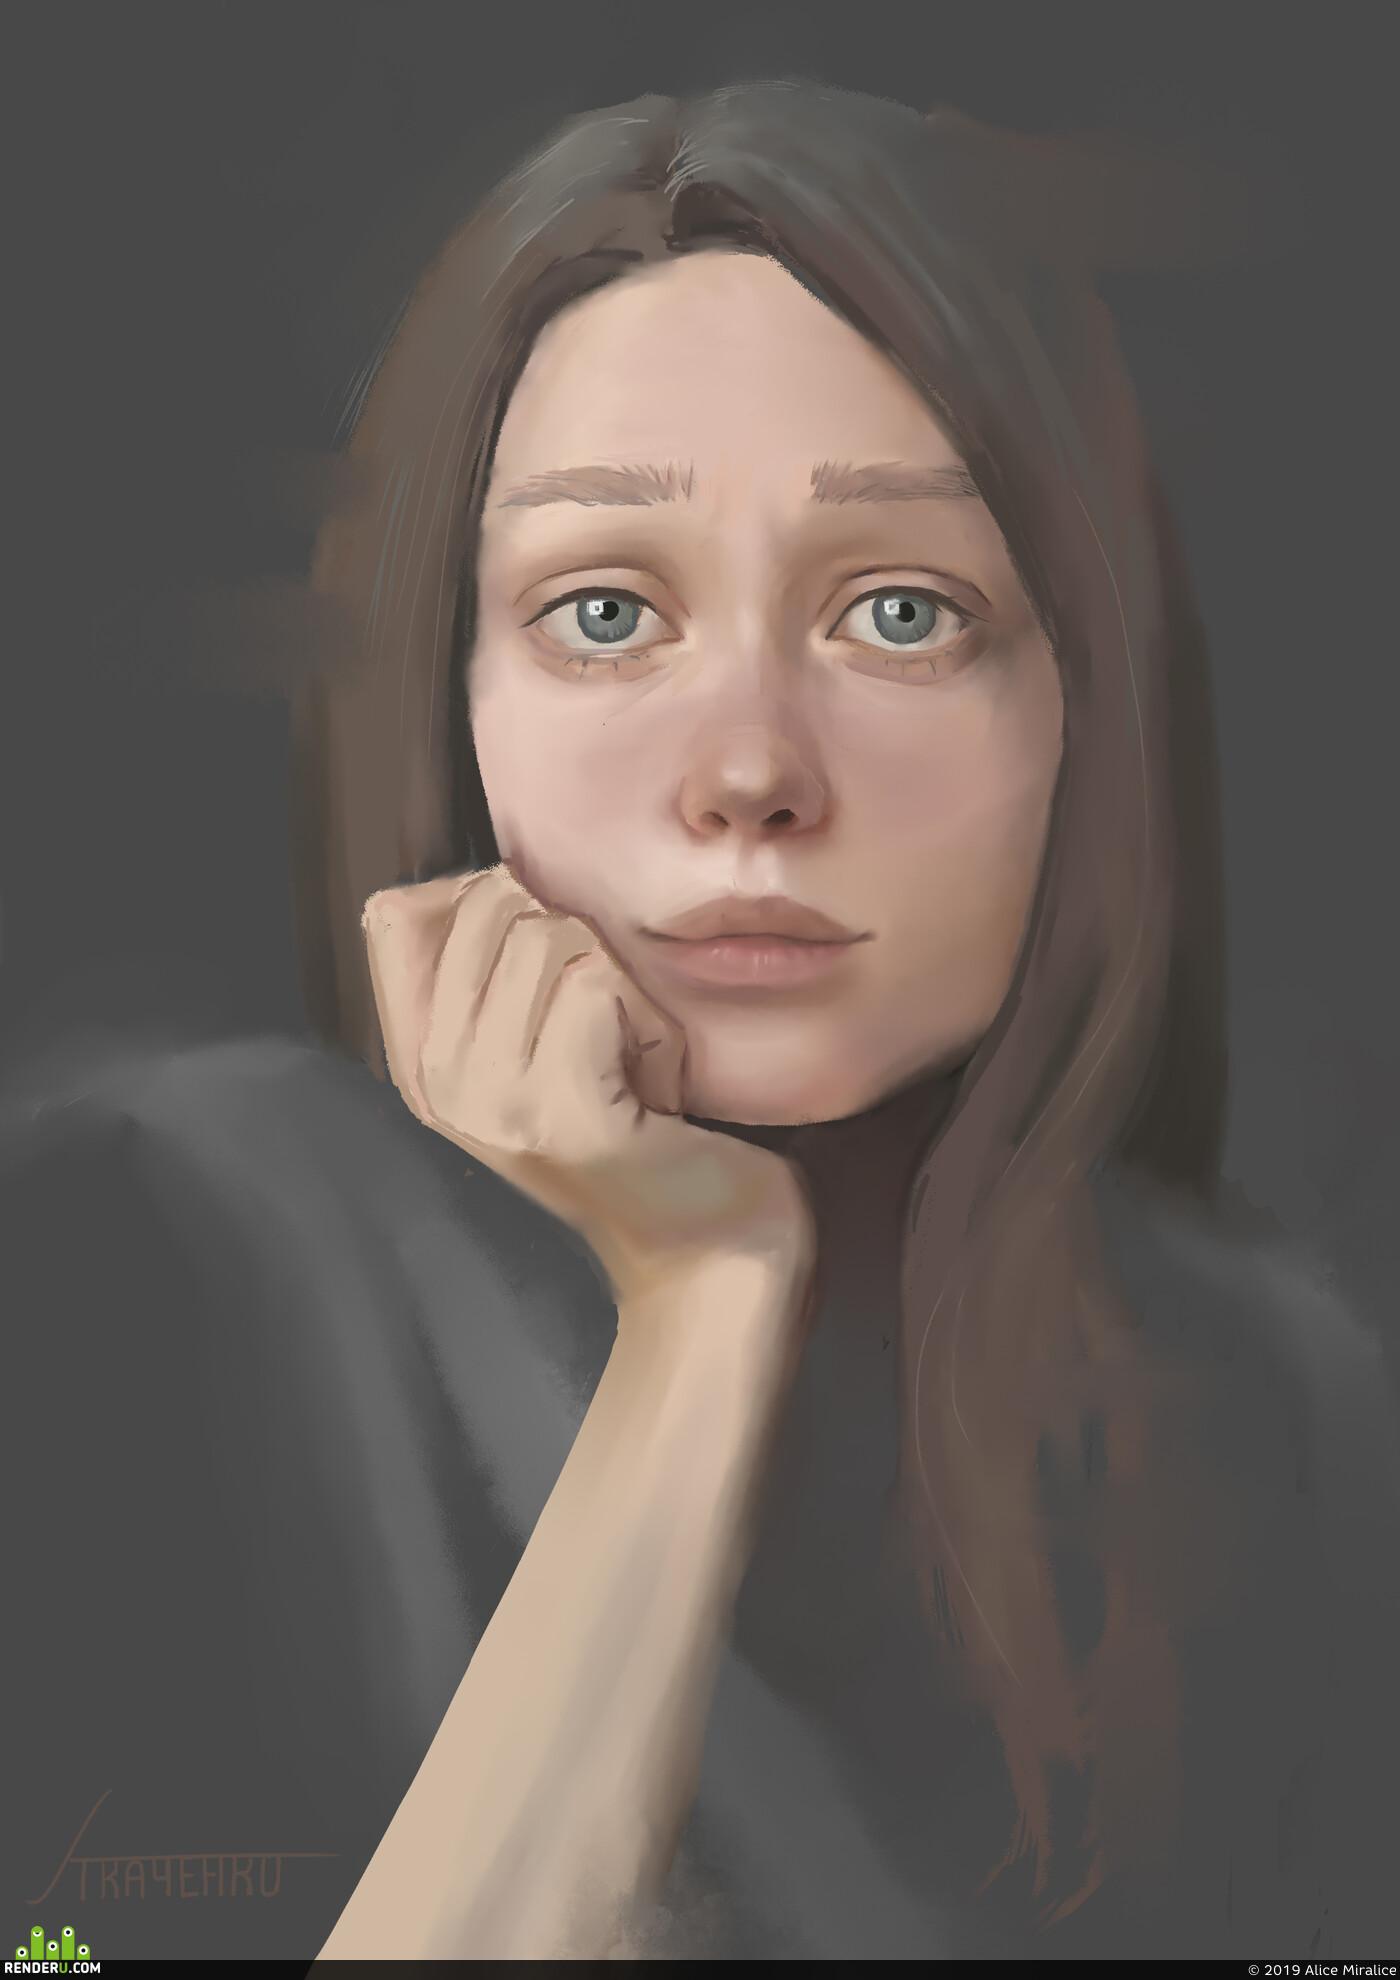 автопортрет, Computer graphics from scratch, Photoshop, self portrait, digital art